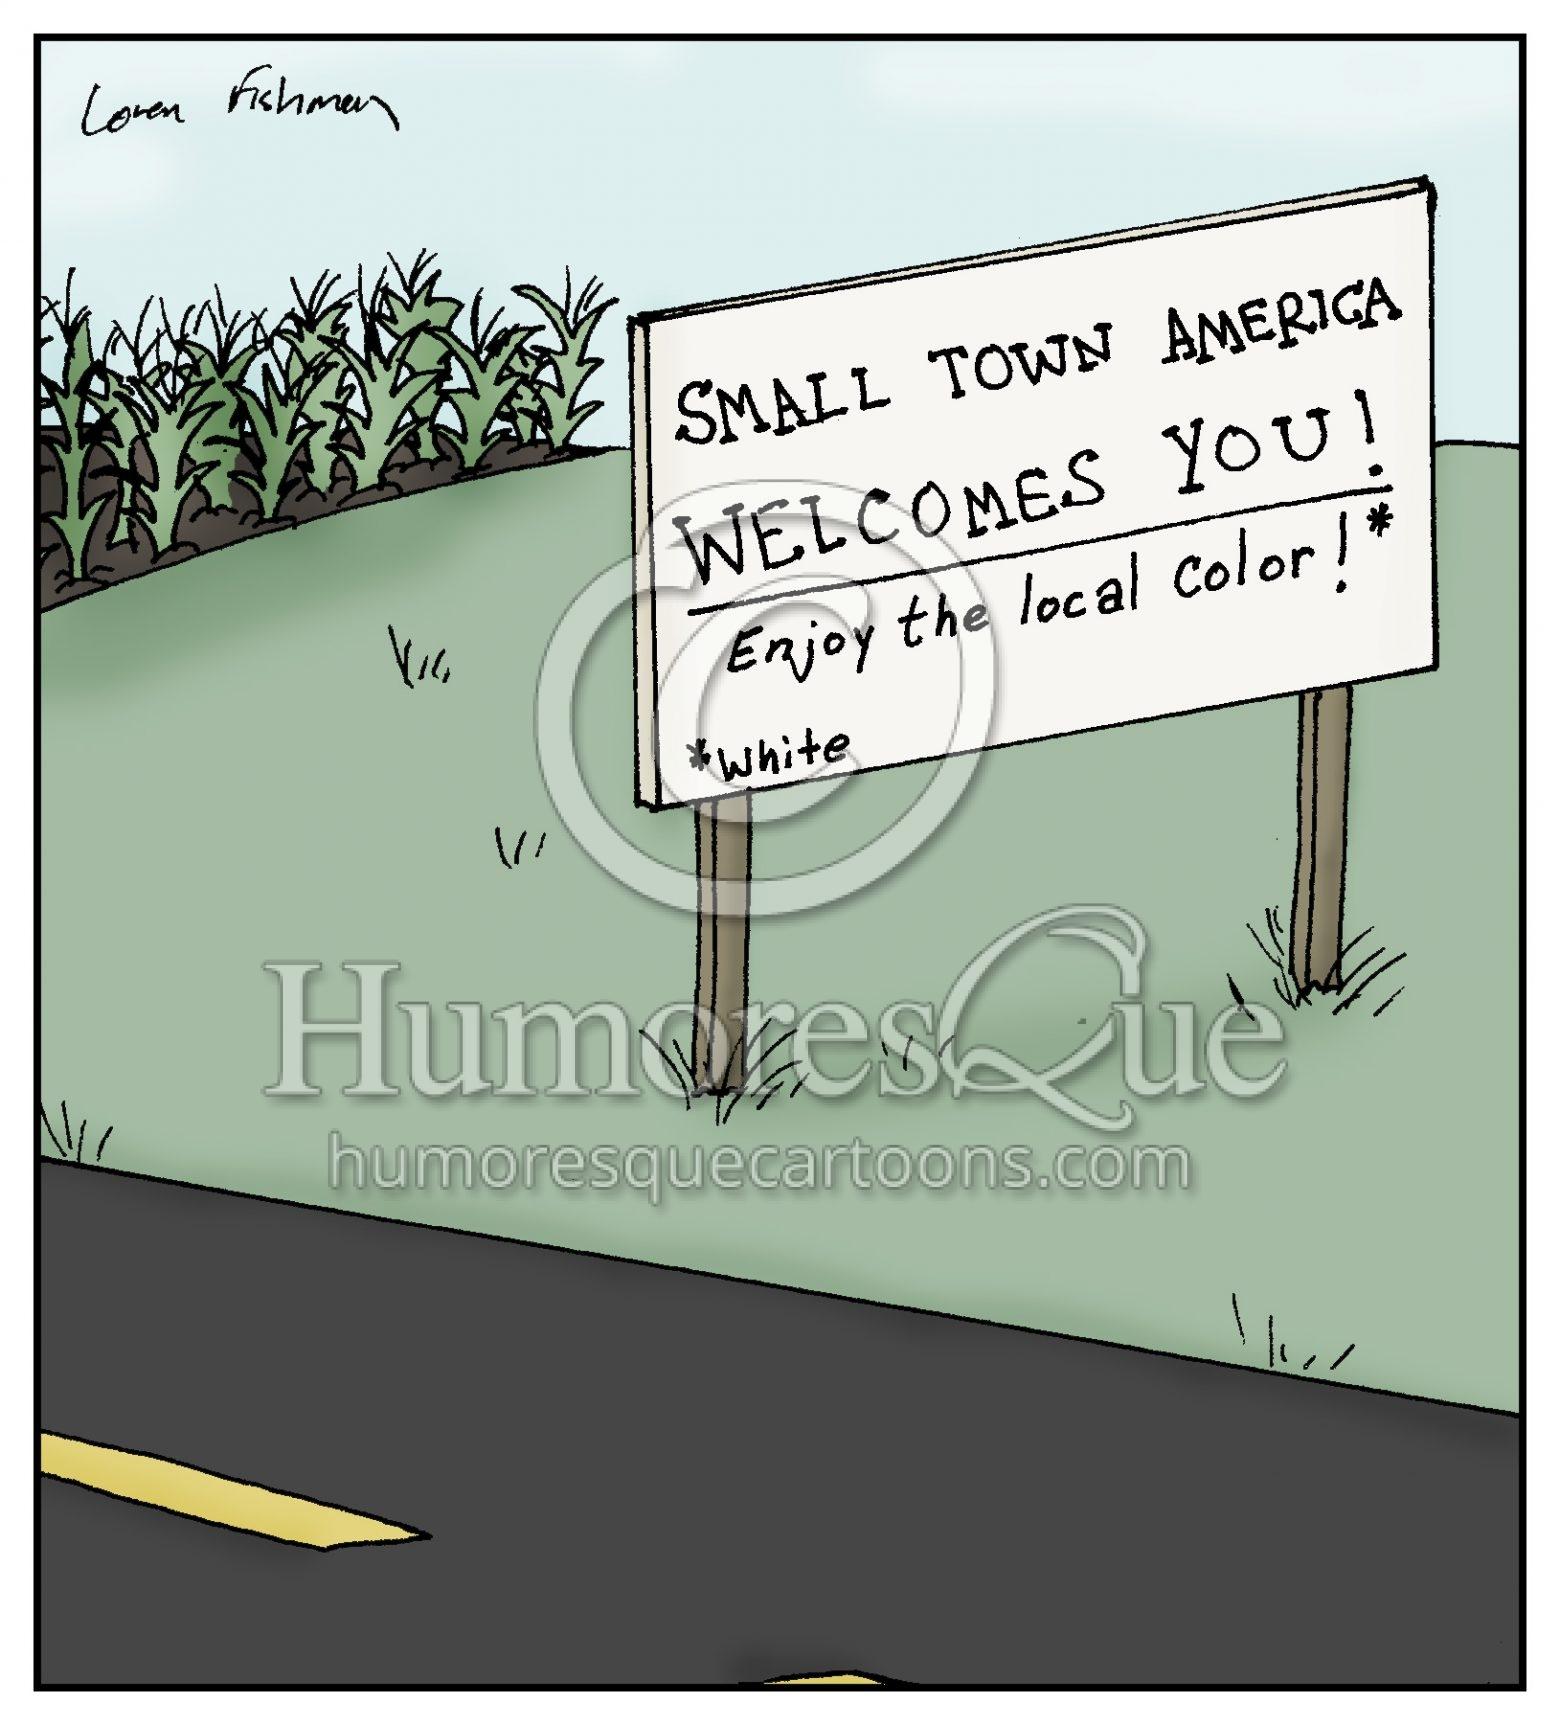 small town america white people cartoon